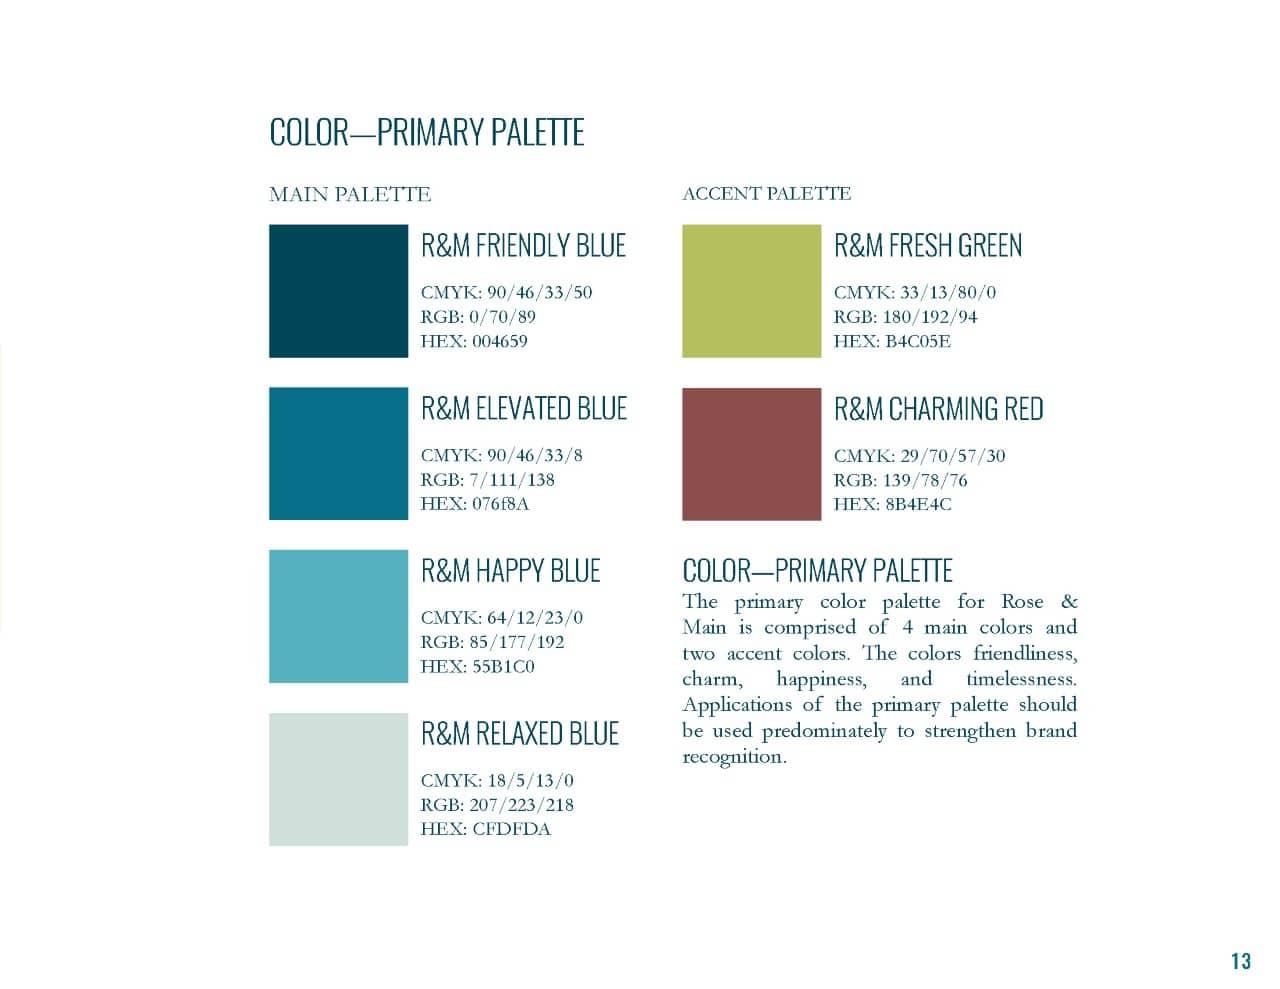 Rose & Main Brand Standards - Place Based Branding color palette